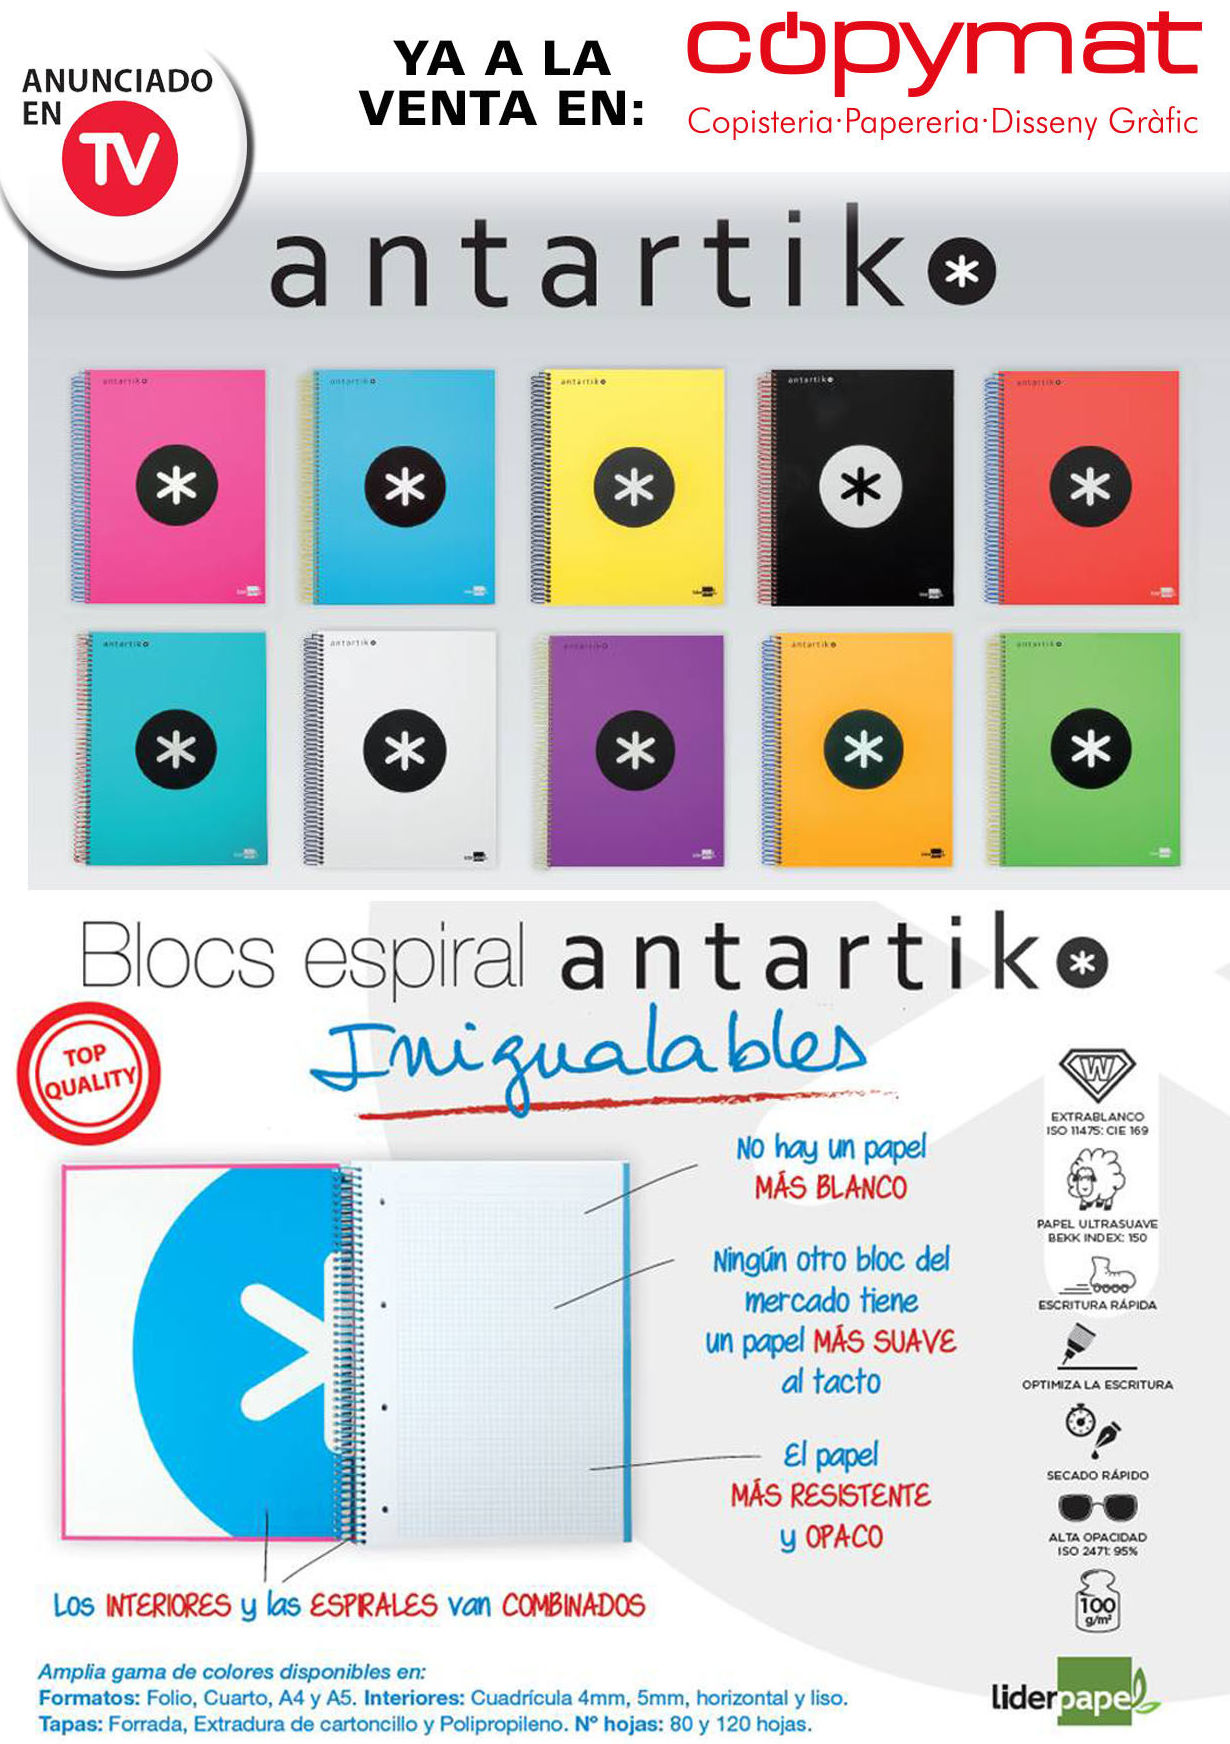 distribuidor antartik